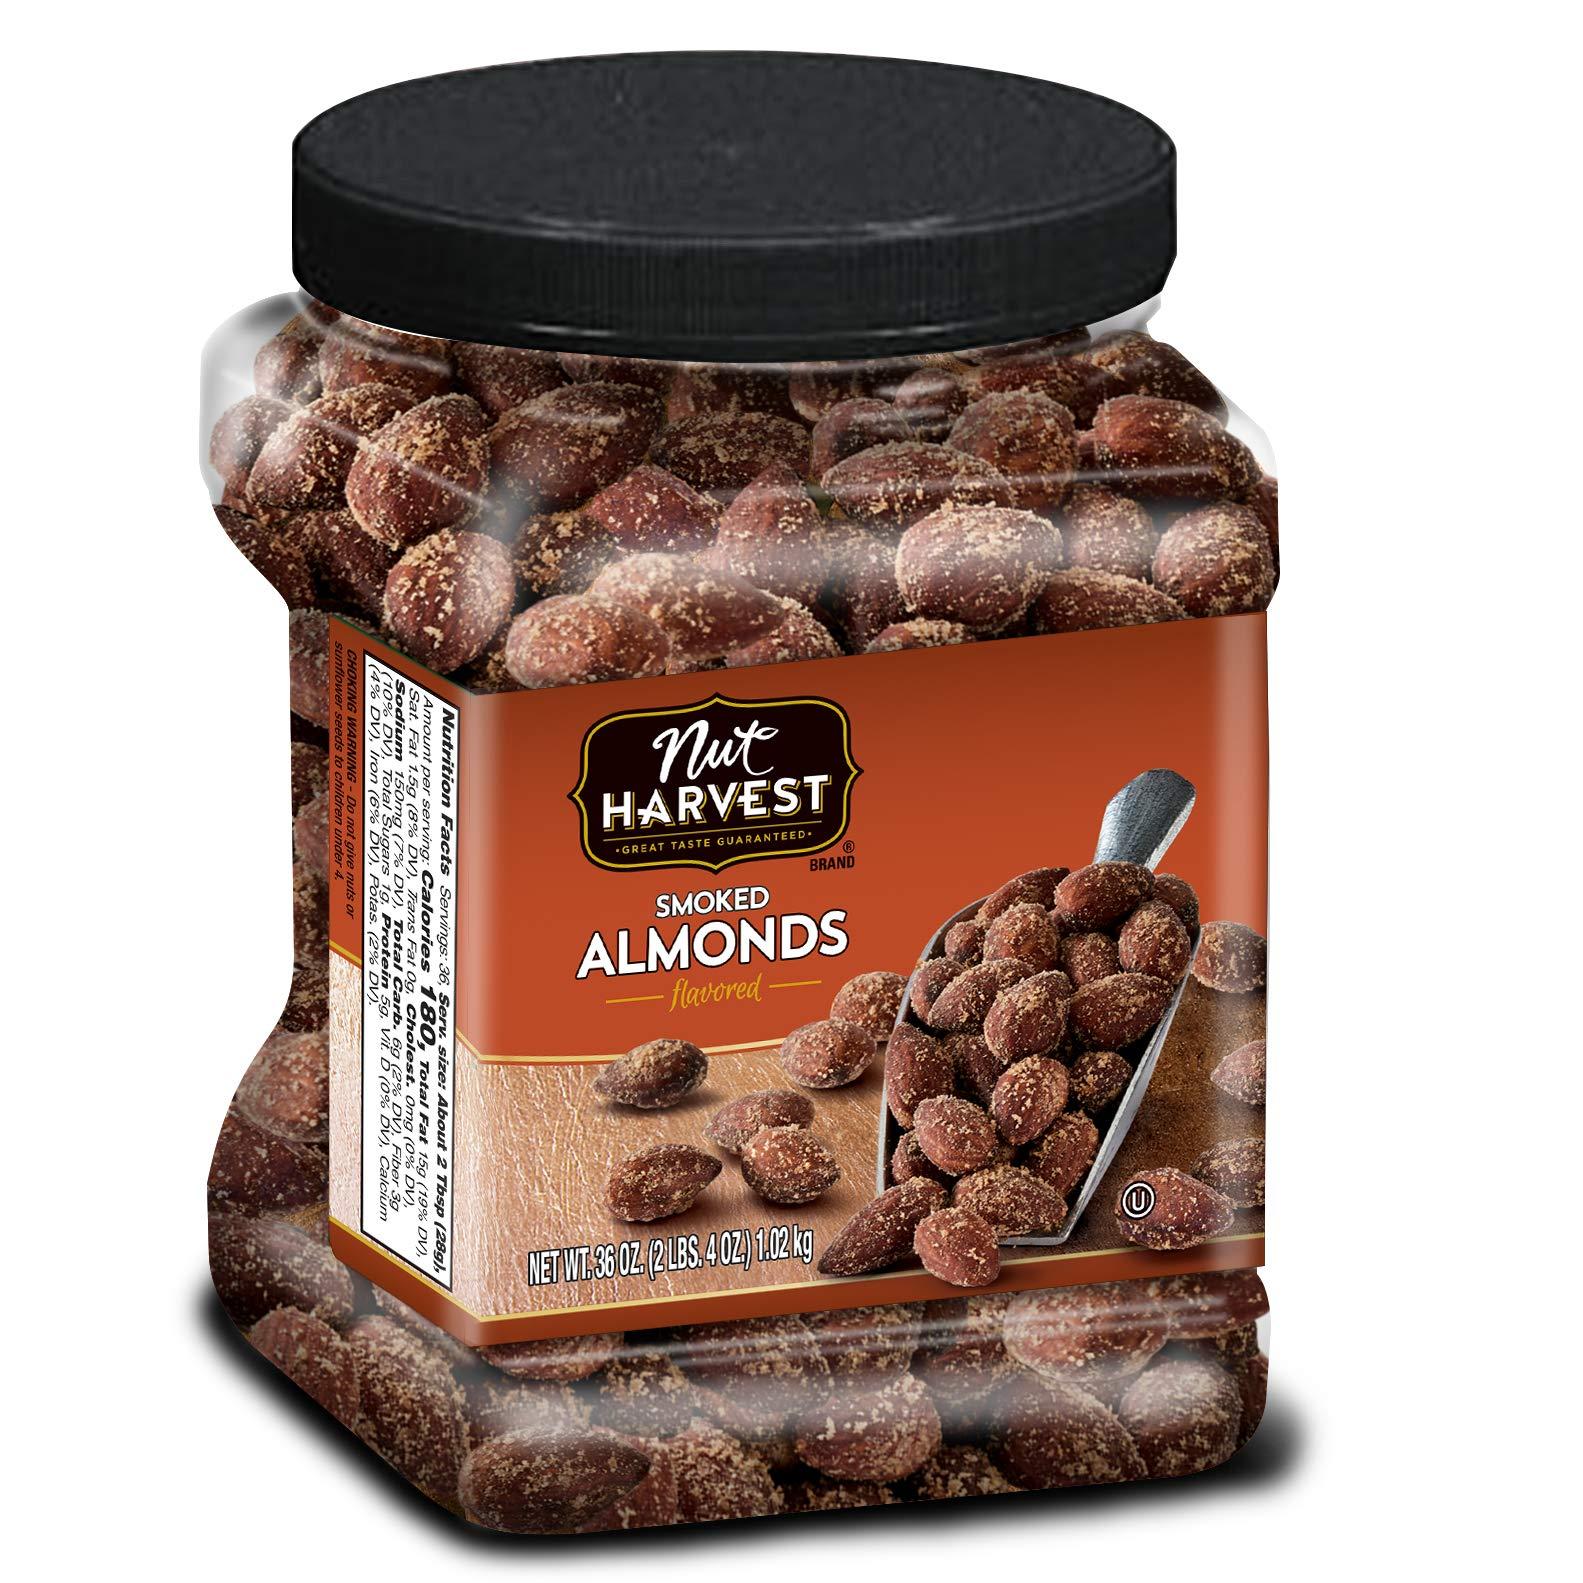 Nut Harvest Almonds, Smoked, 36 Ounce